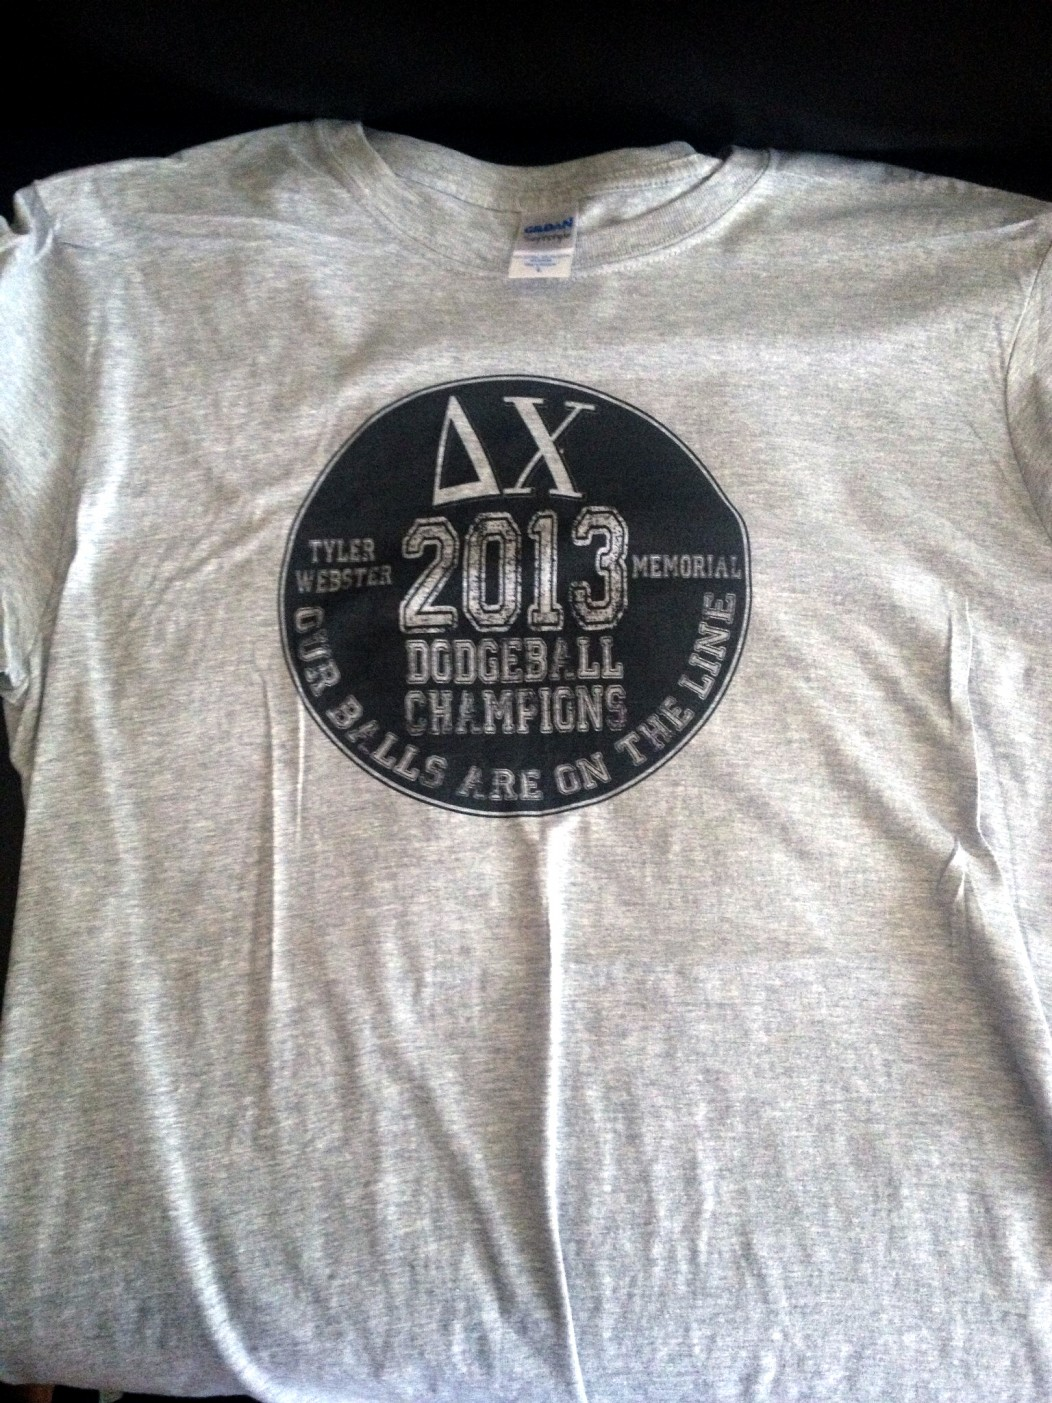 Portfolio Tags 10 Dollar Shirt Store Think Printing Graphics